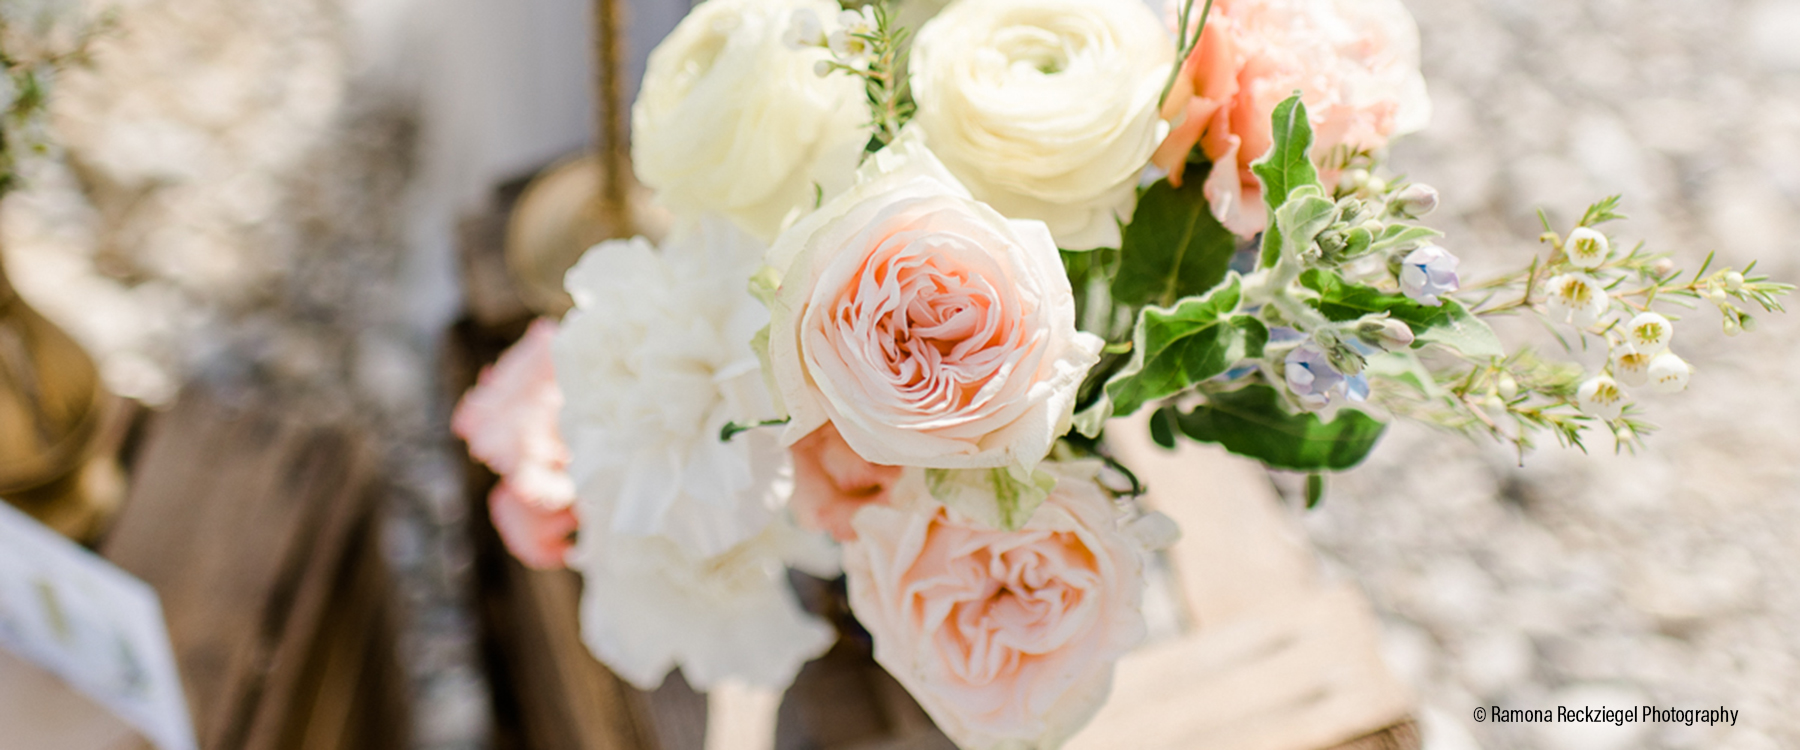 wedding-fotos-cinema-rrp-9447.jpg